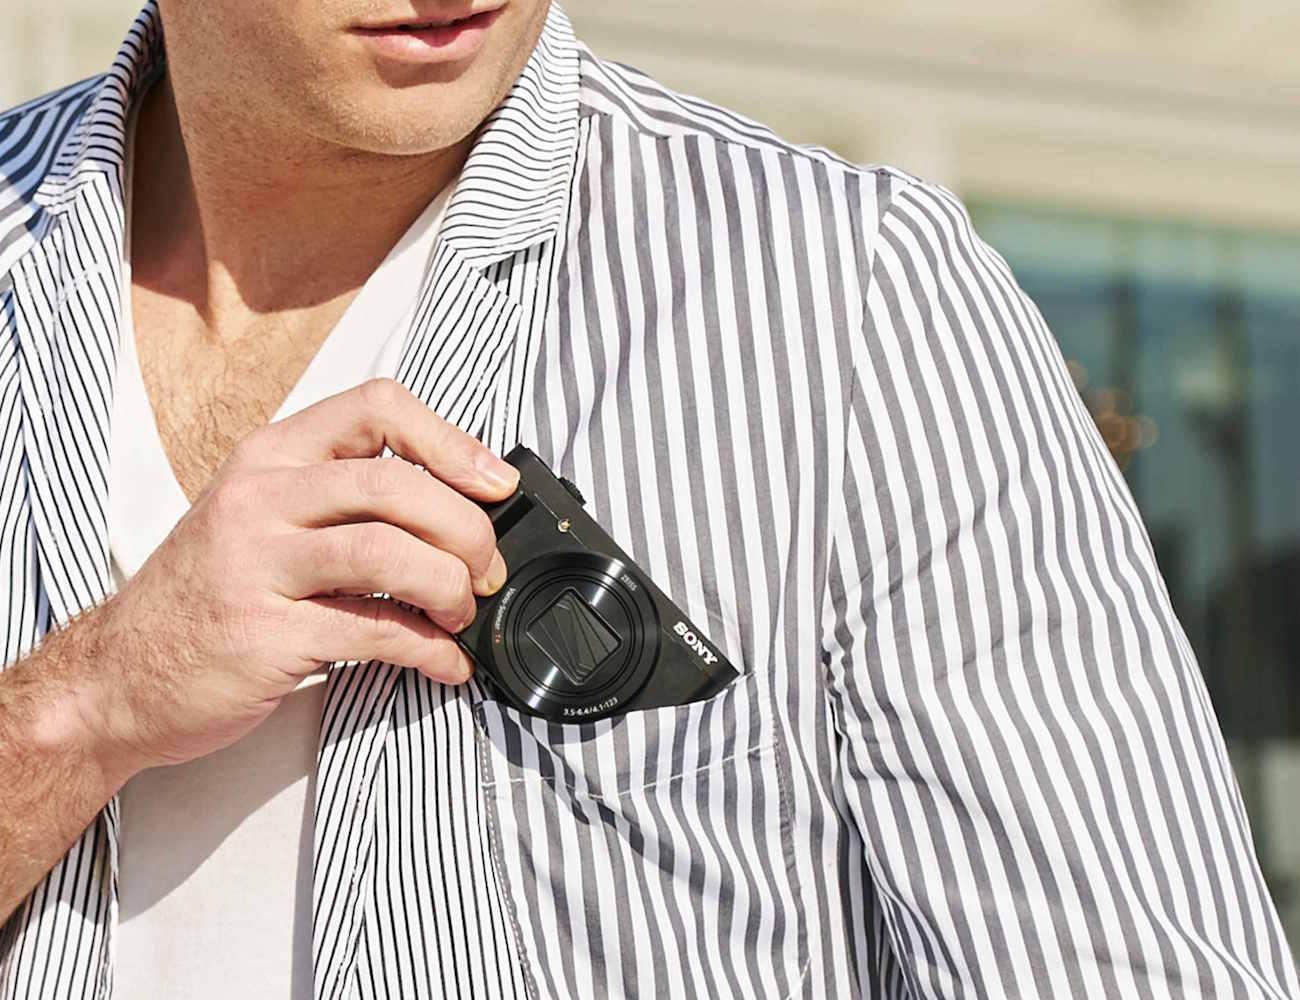 Sony HX80 Compact Camera